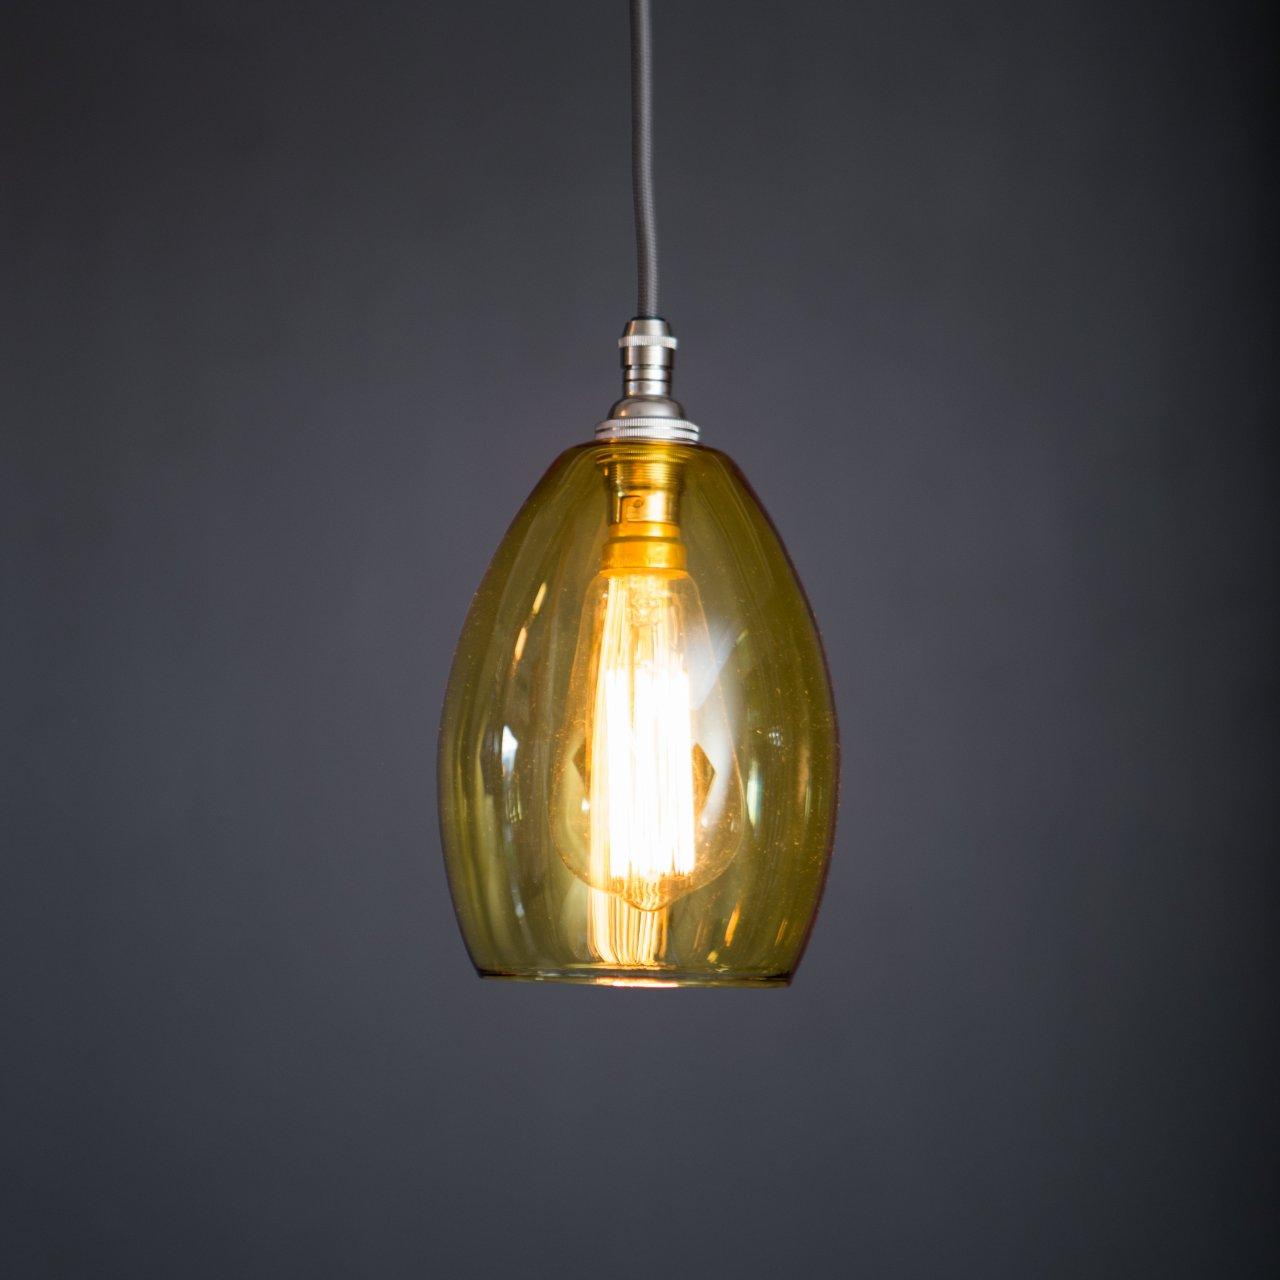 feccaa7ddb2 Yellow glass pendant Light Bertie Small - Glow Lighting